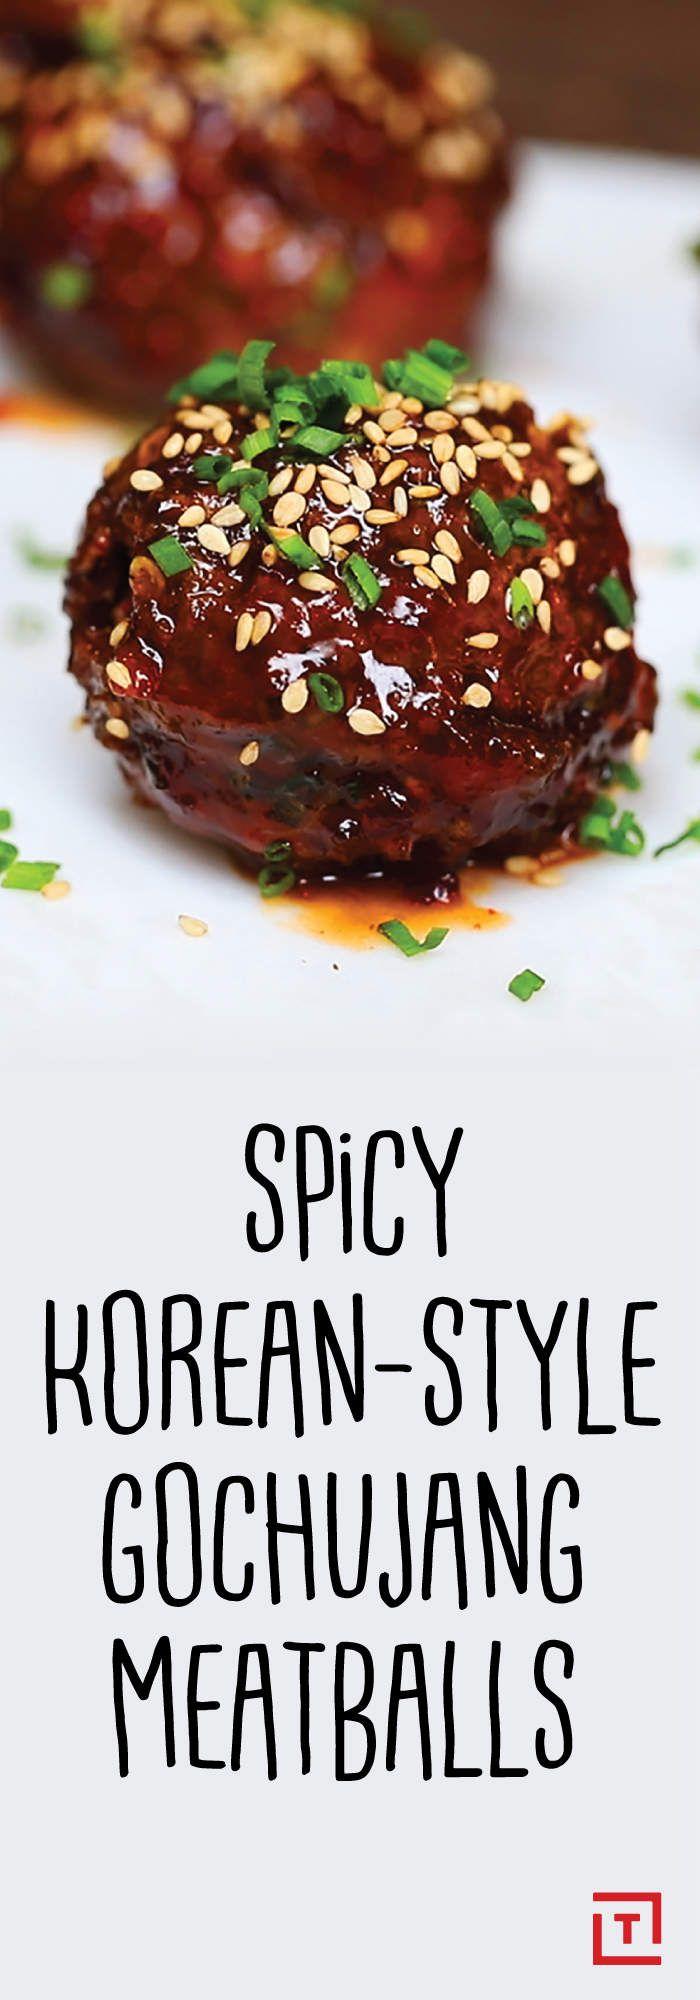 Korean Style Gochujang Meatballs. -Thrillist #SeoulFood #Foodies